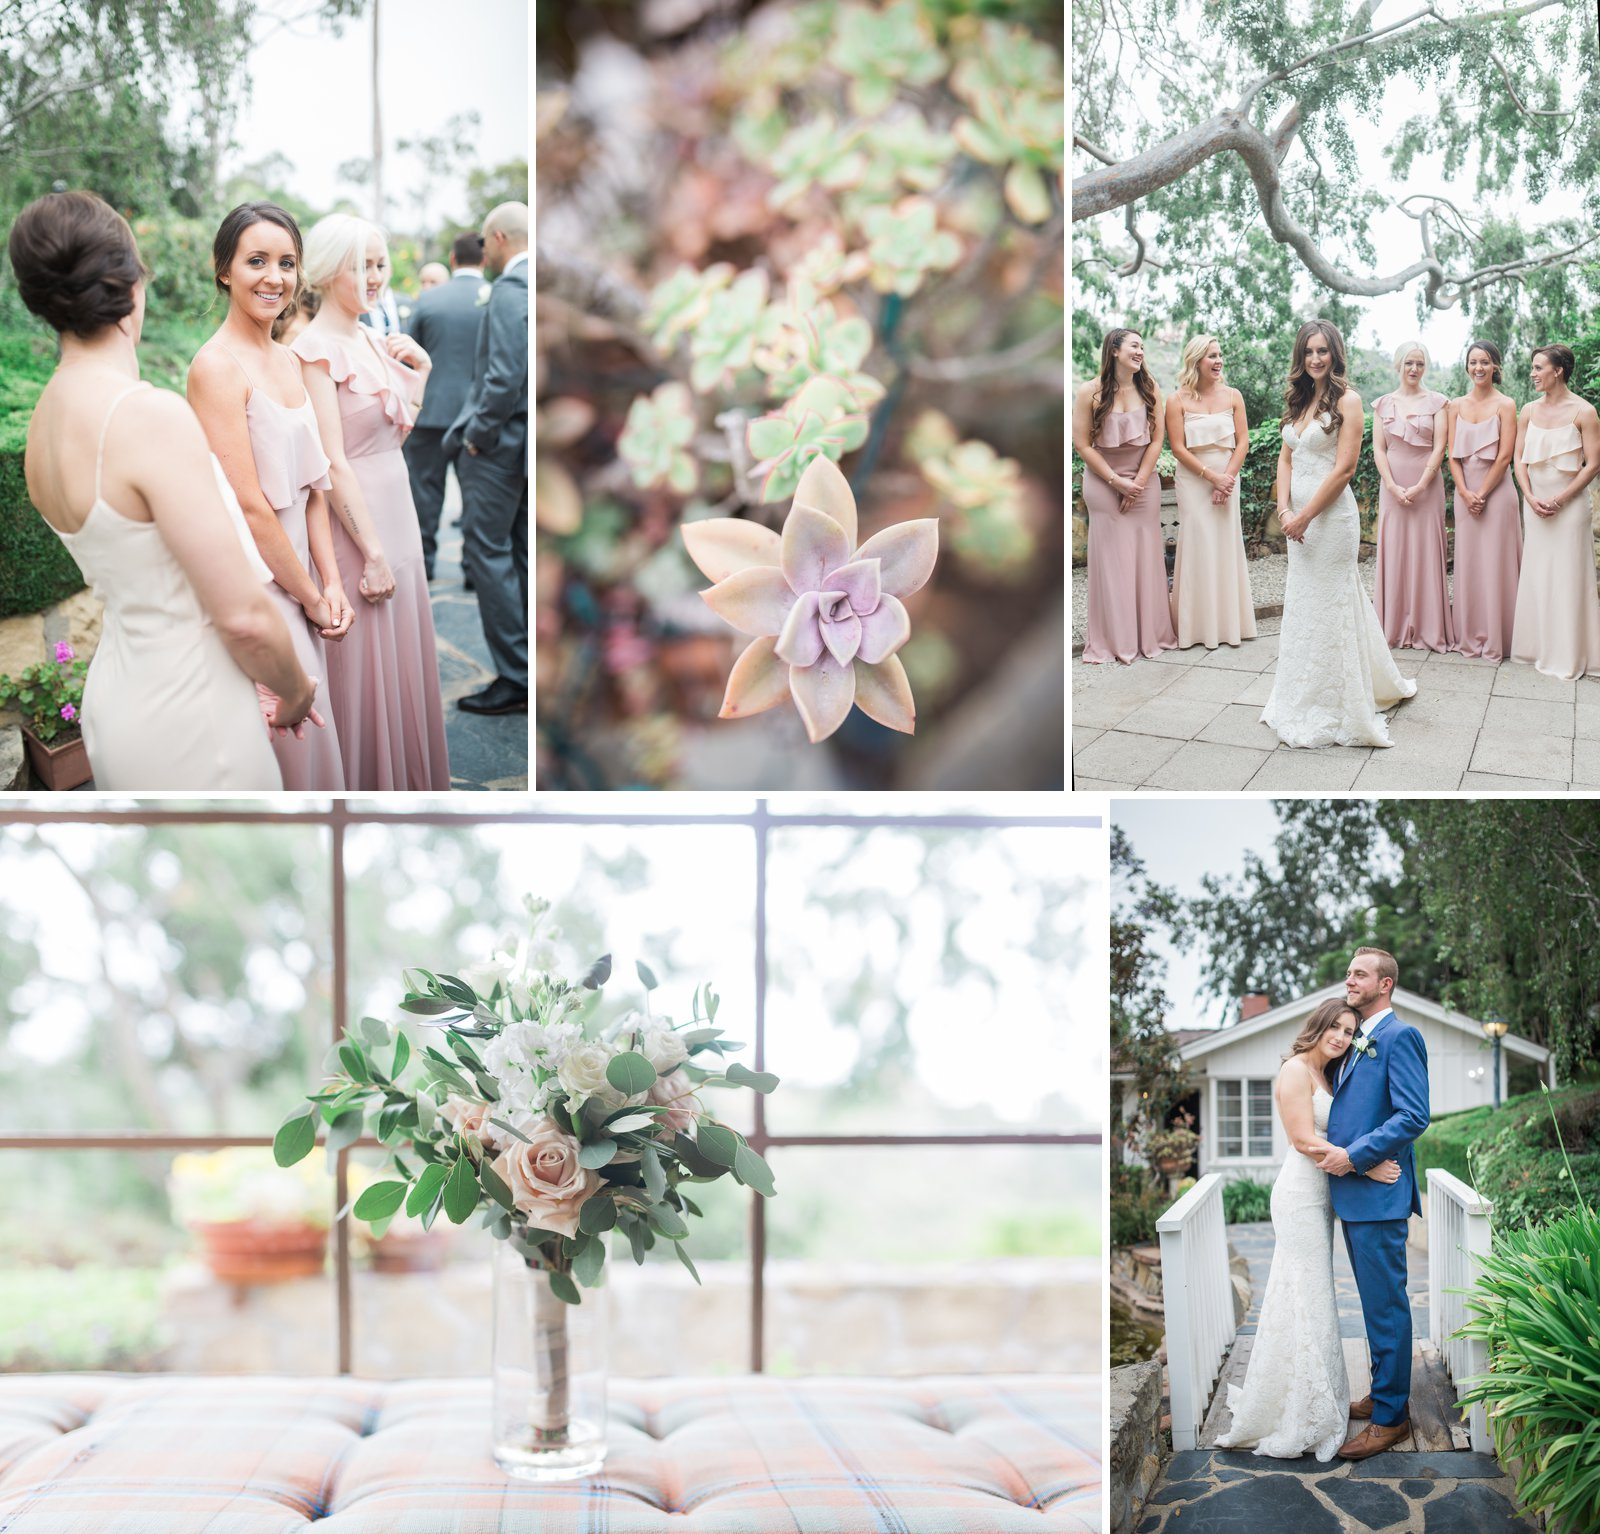 Mediterranean vibes for this Santa Barbara Riviera Wedding